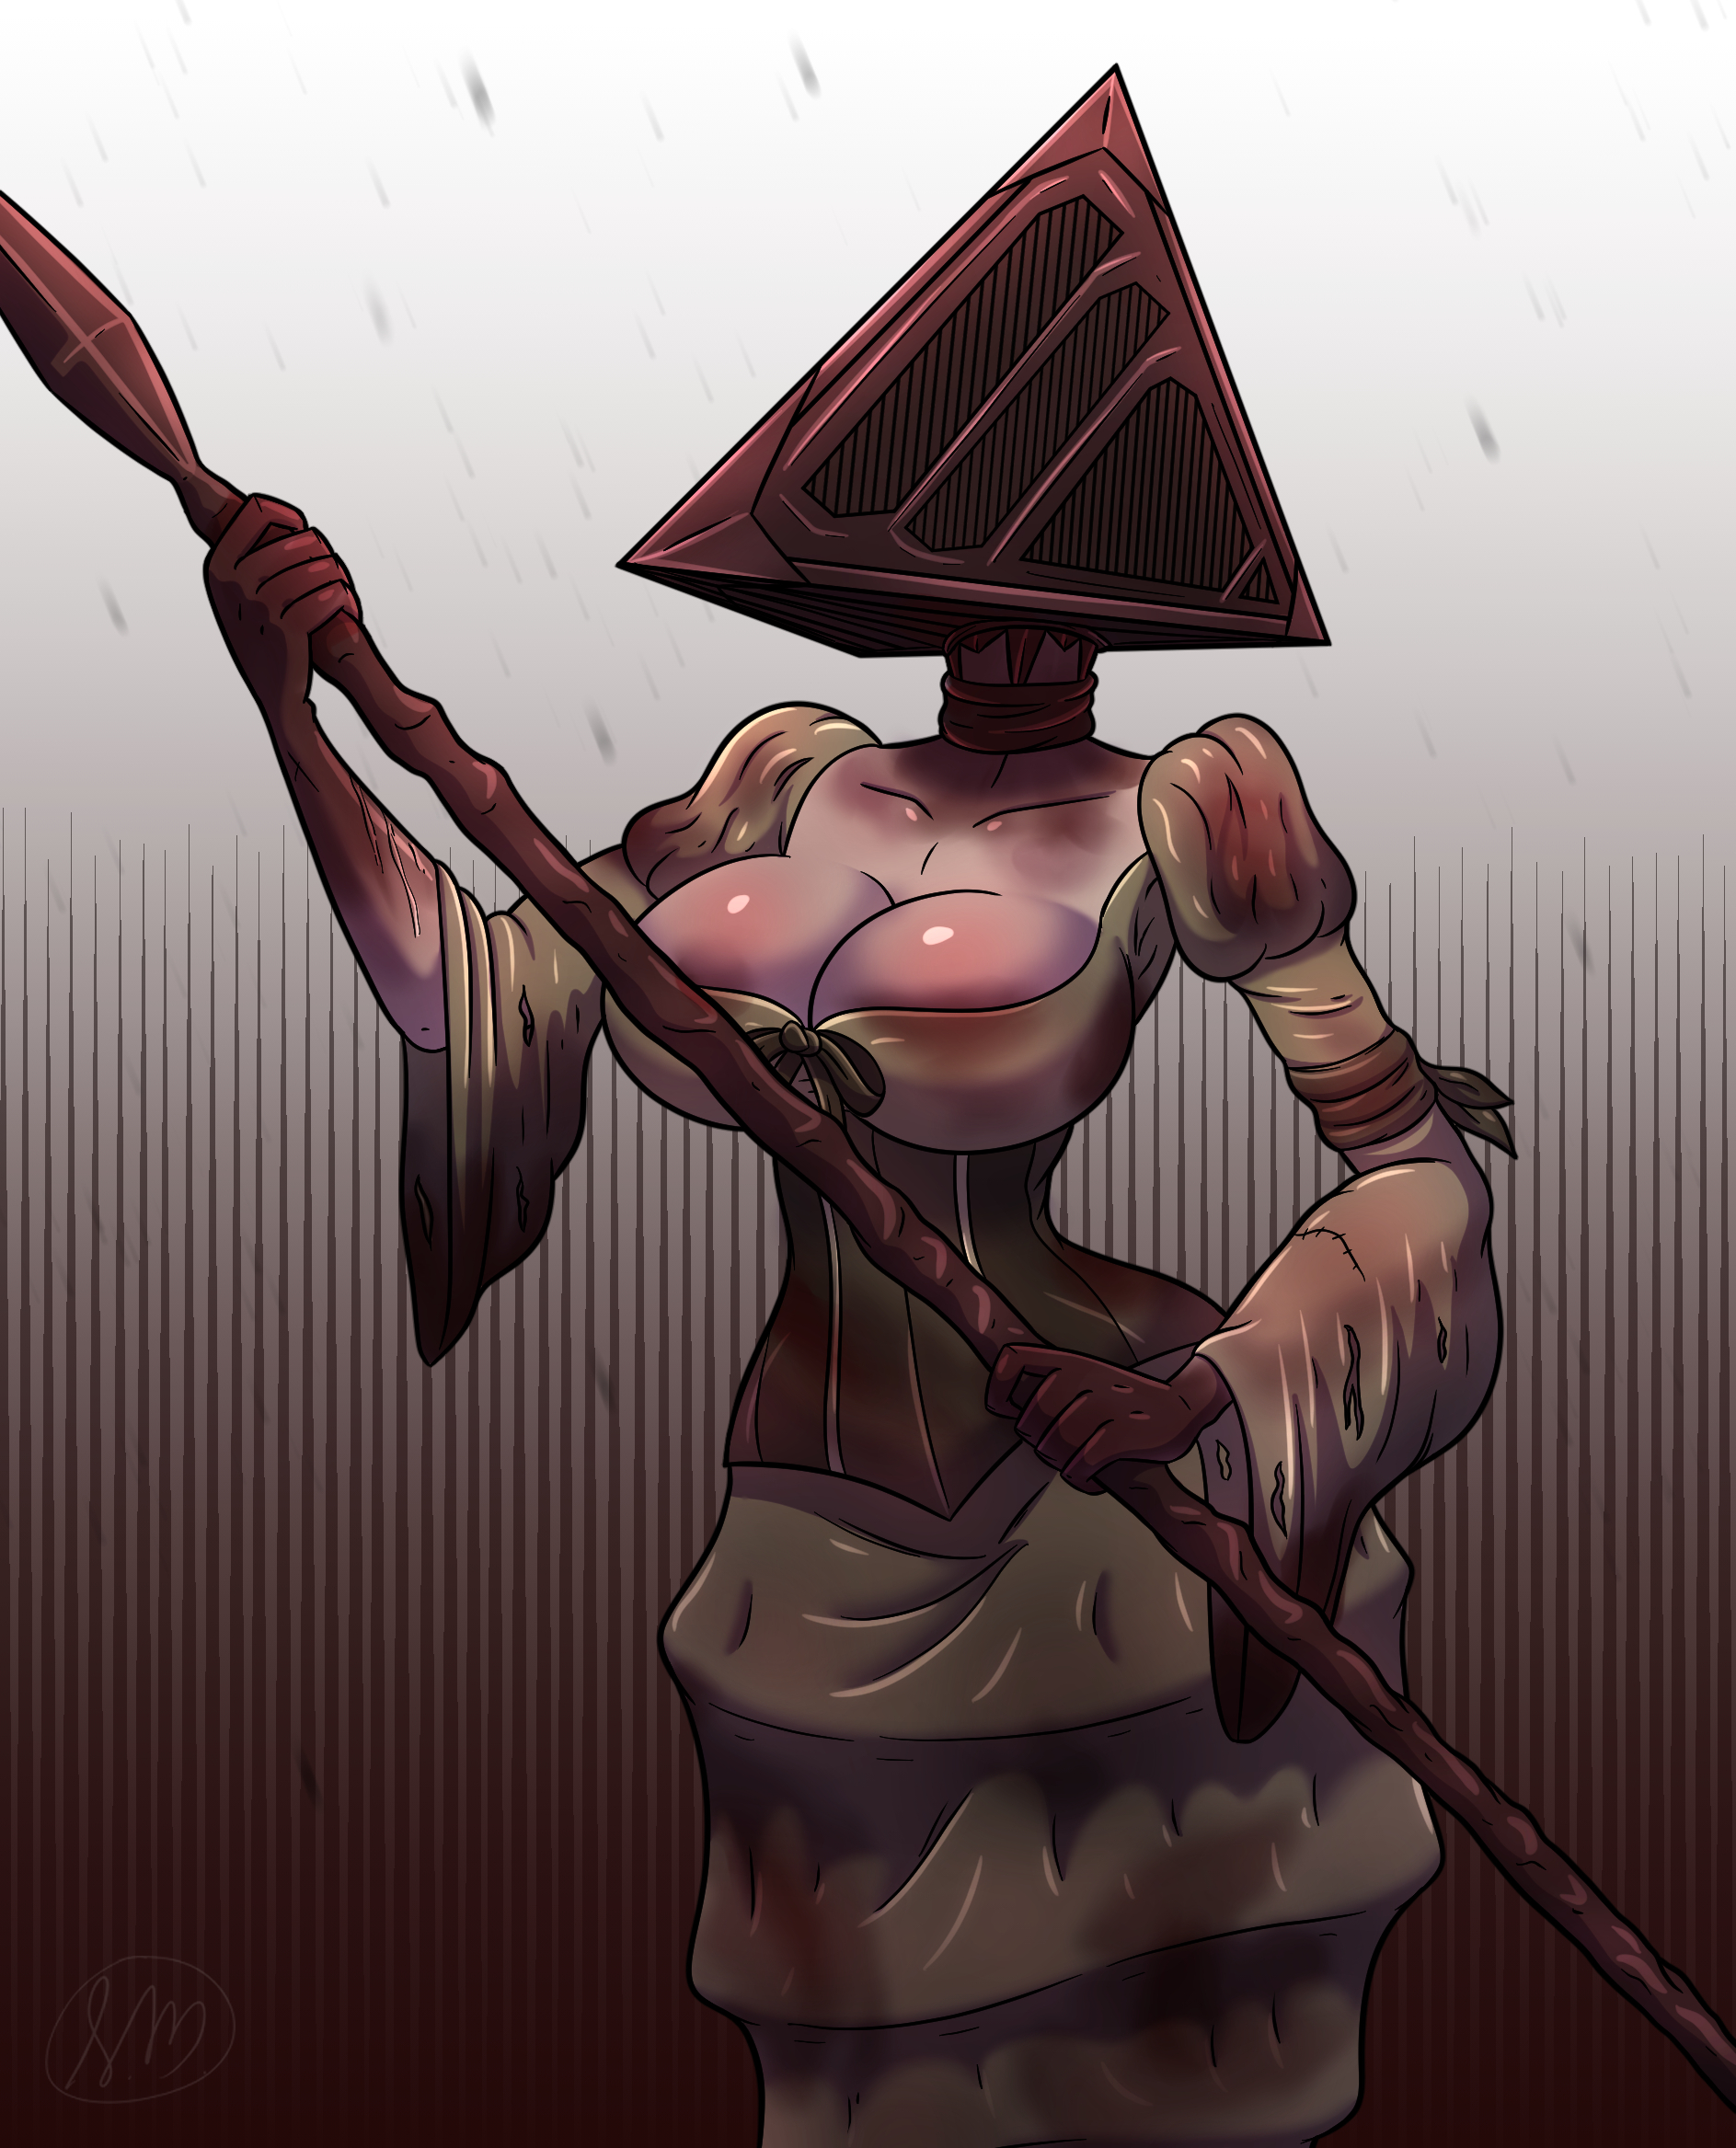 Triangle lady